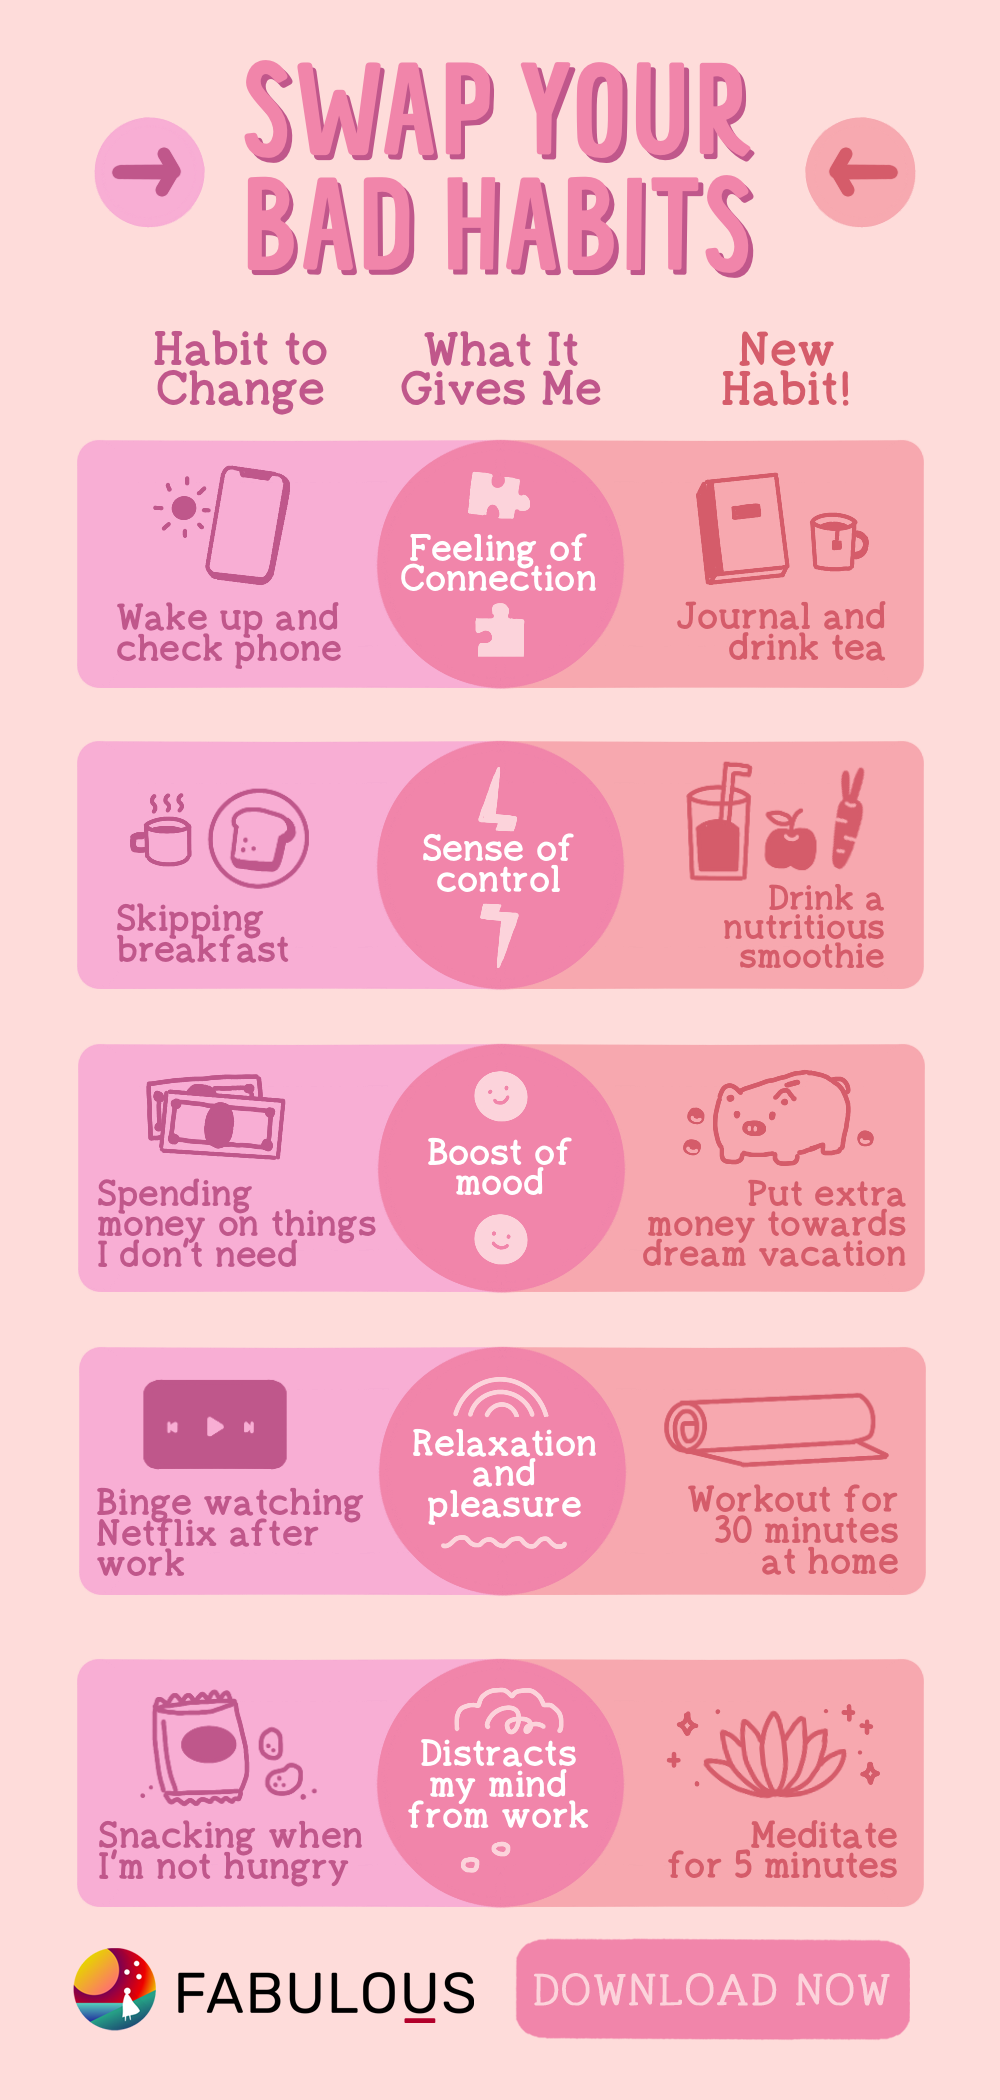 Swap Your Bad Habits